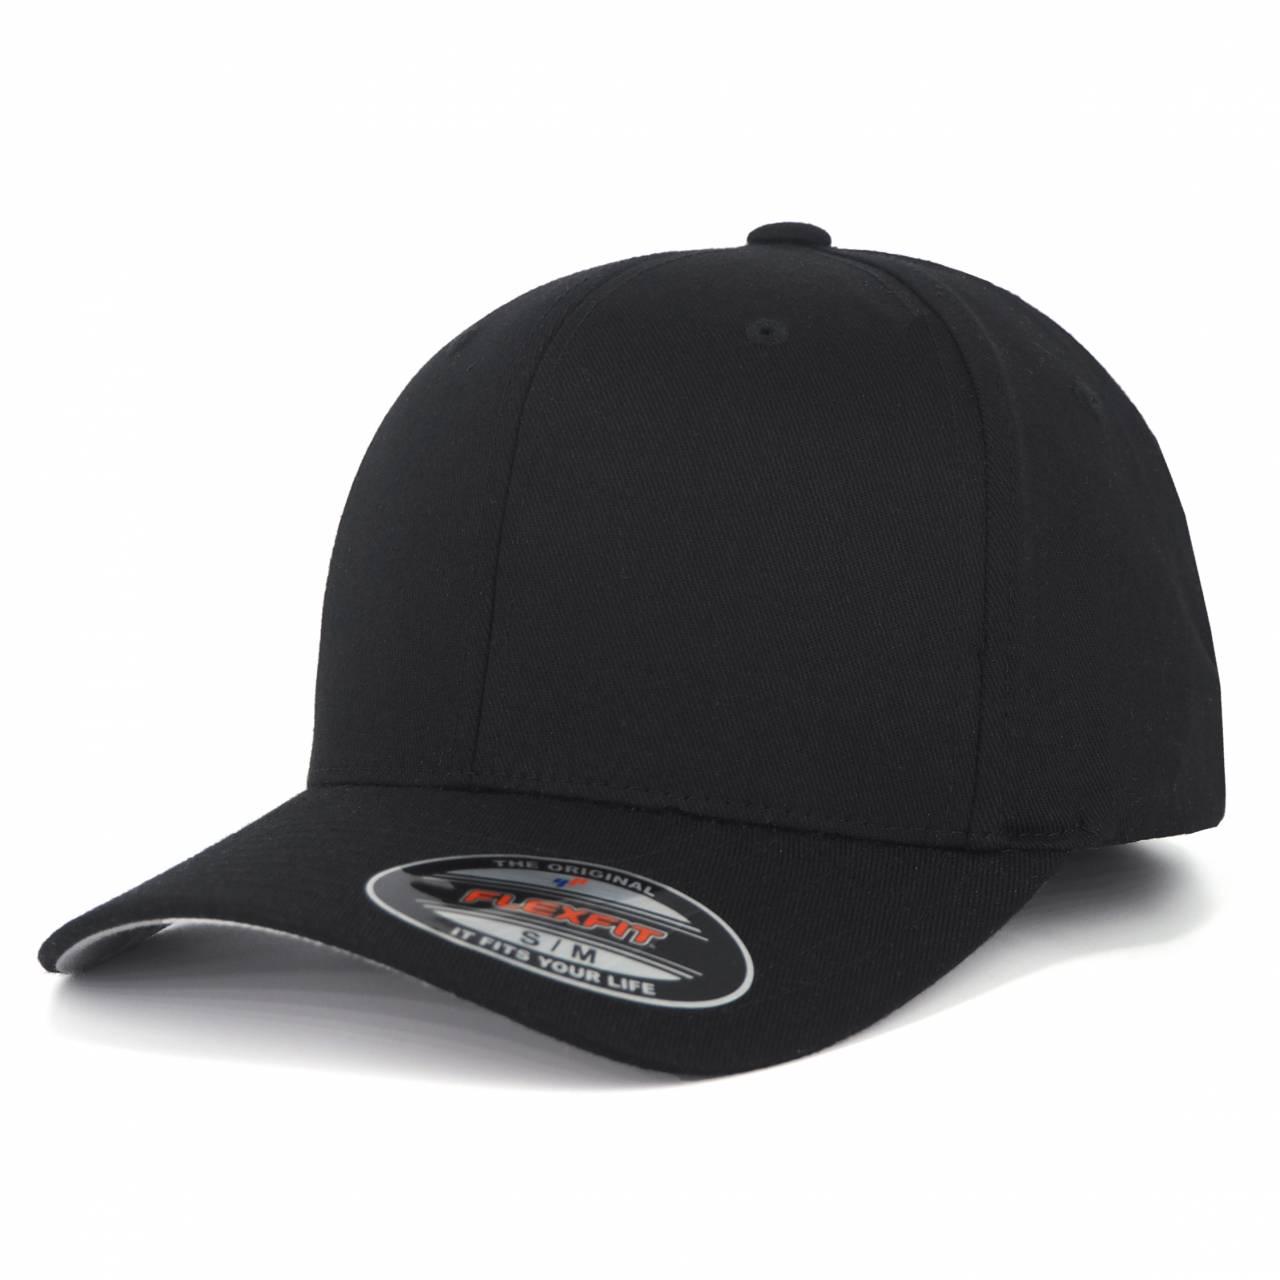 6277-00007-00 FLEXFIT WOOLY COMBED BLACK BLANK CAP